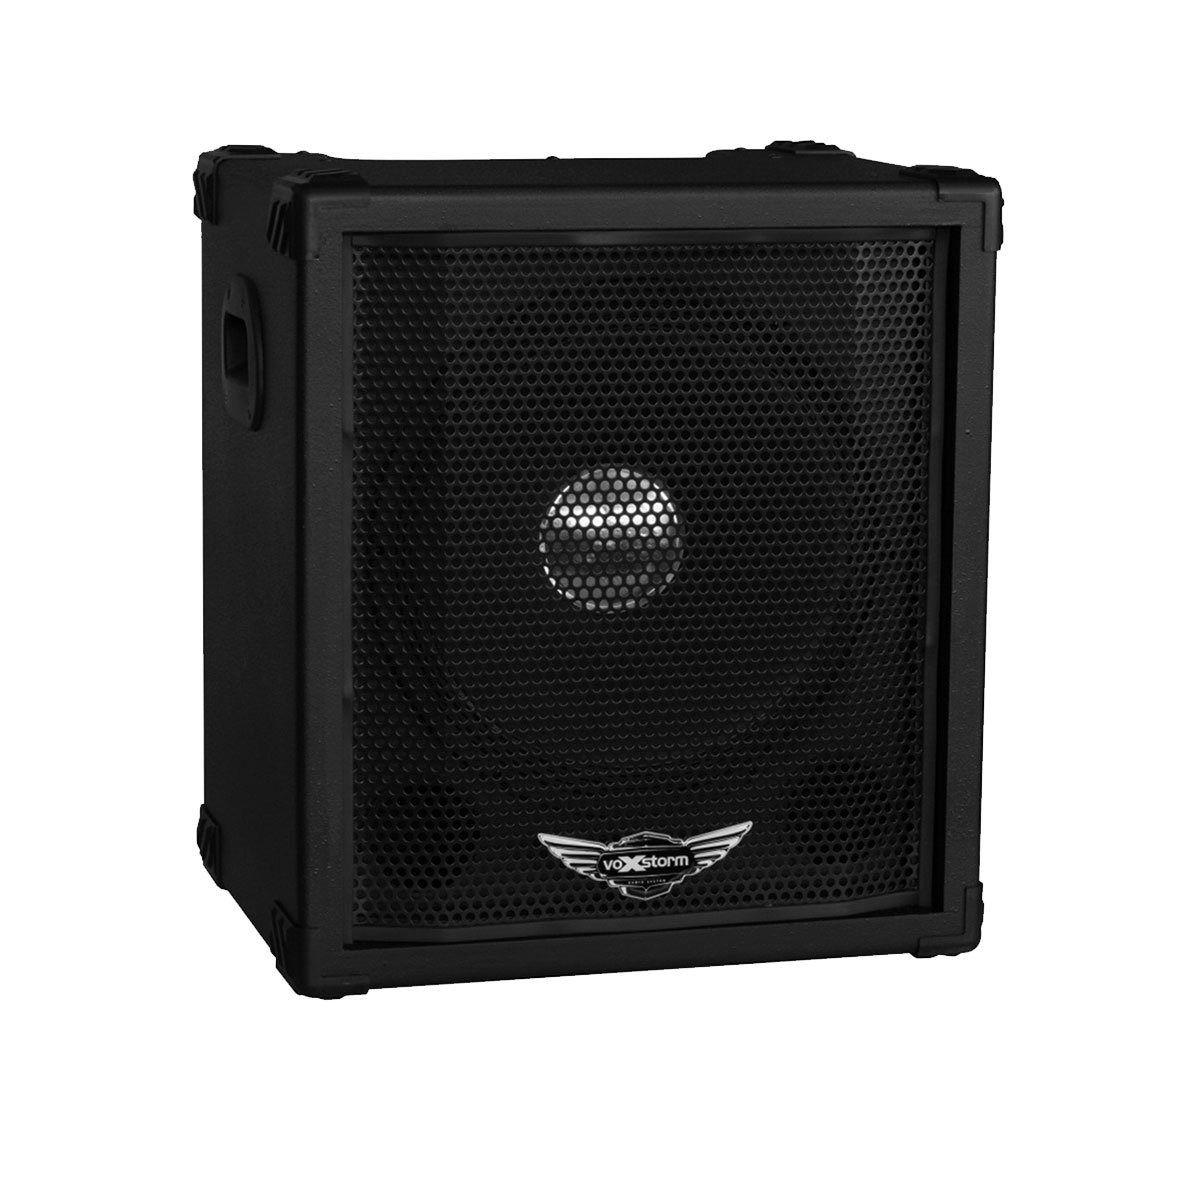 "Amplificador Baixo Voxtorm Cb250 15"" Top Bass  - Luggi Instrumentos Musicais"